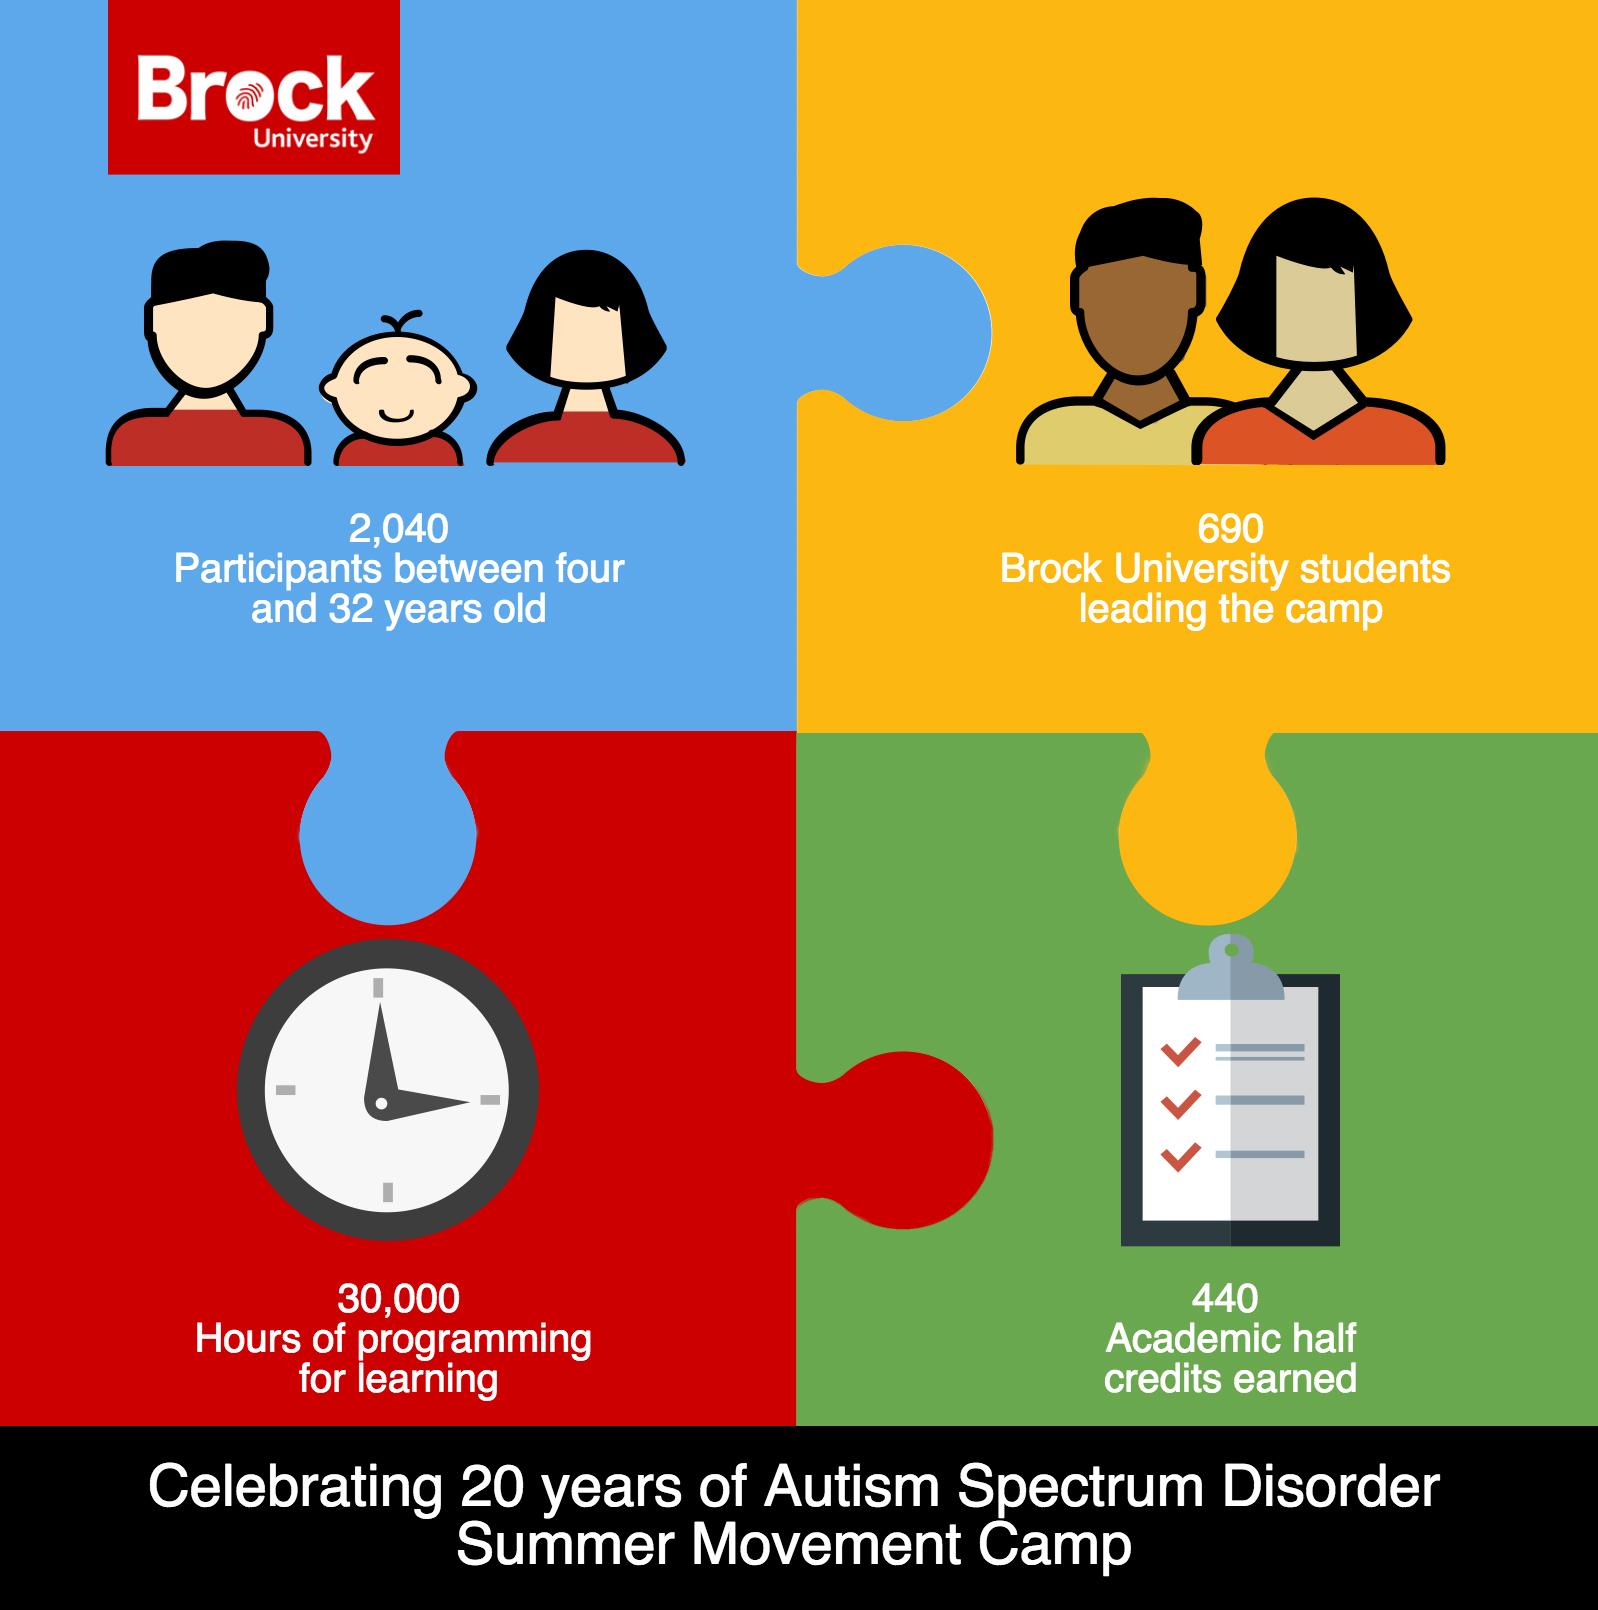 Brock s Autism Spectrum Disorder Camp celebrates 20 years – The